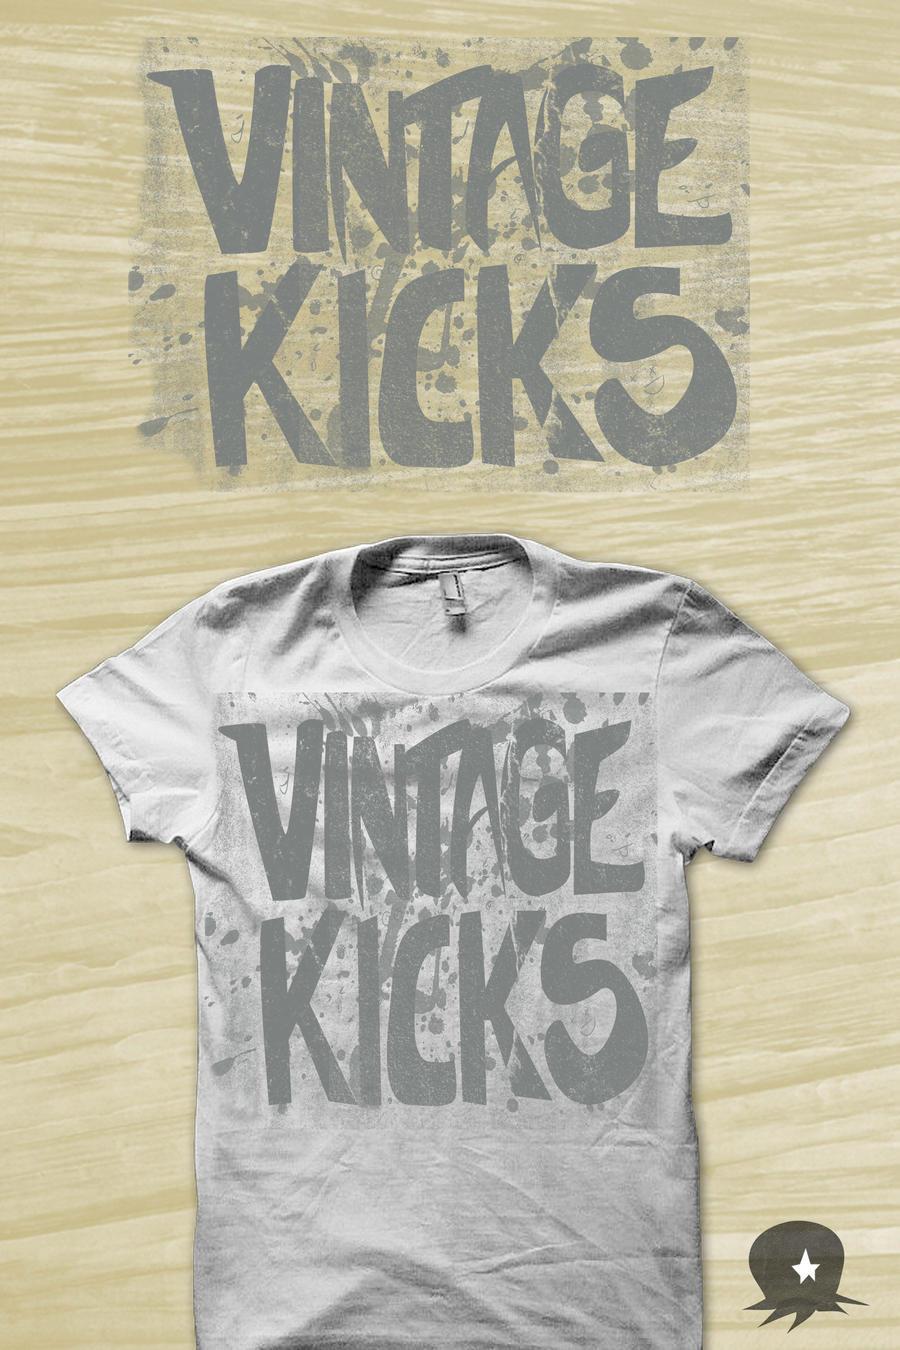 Vintage Shirt by baahgoesthesheep